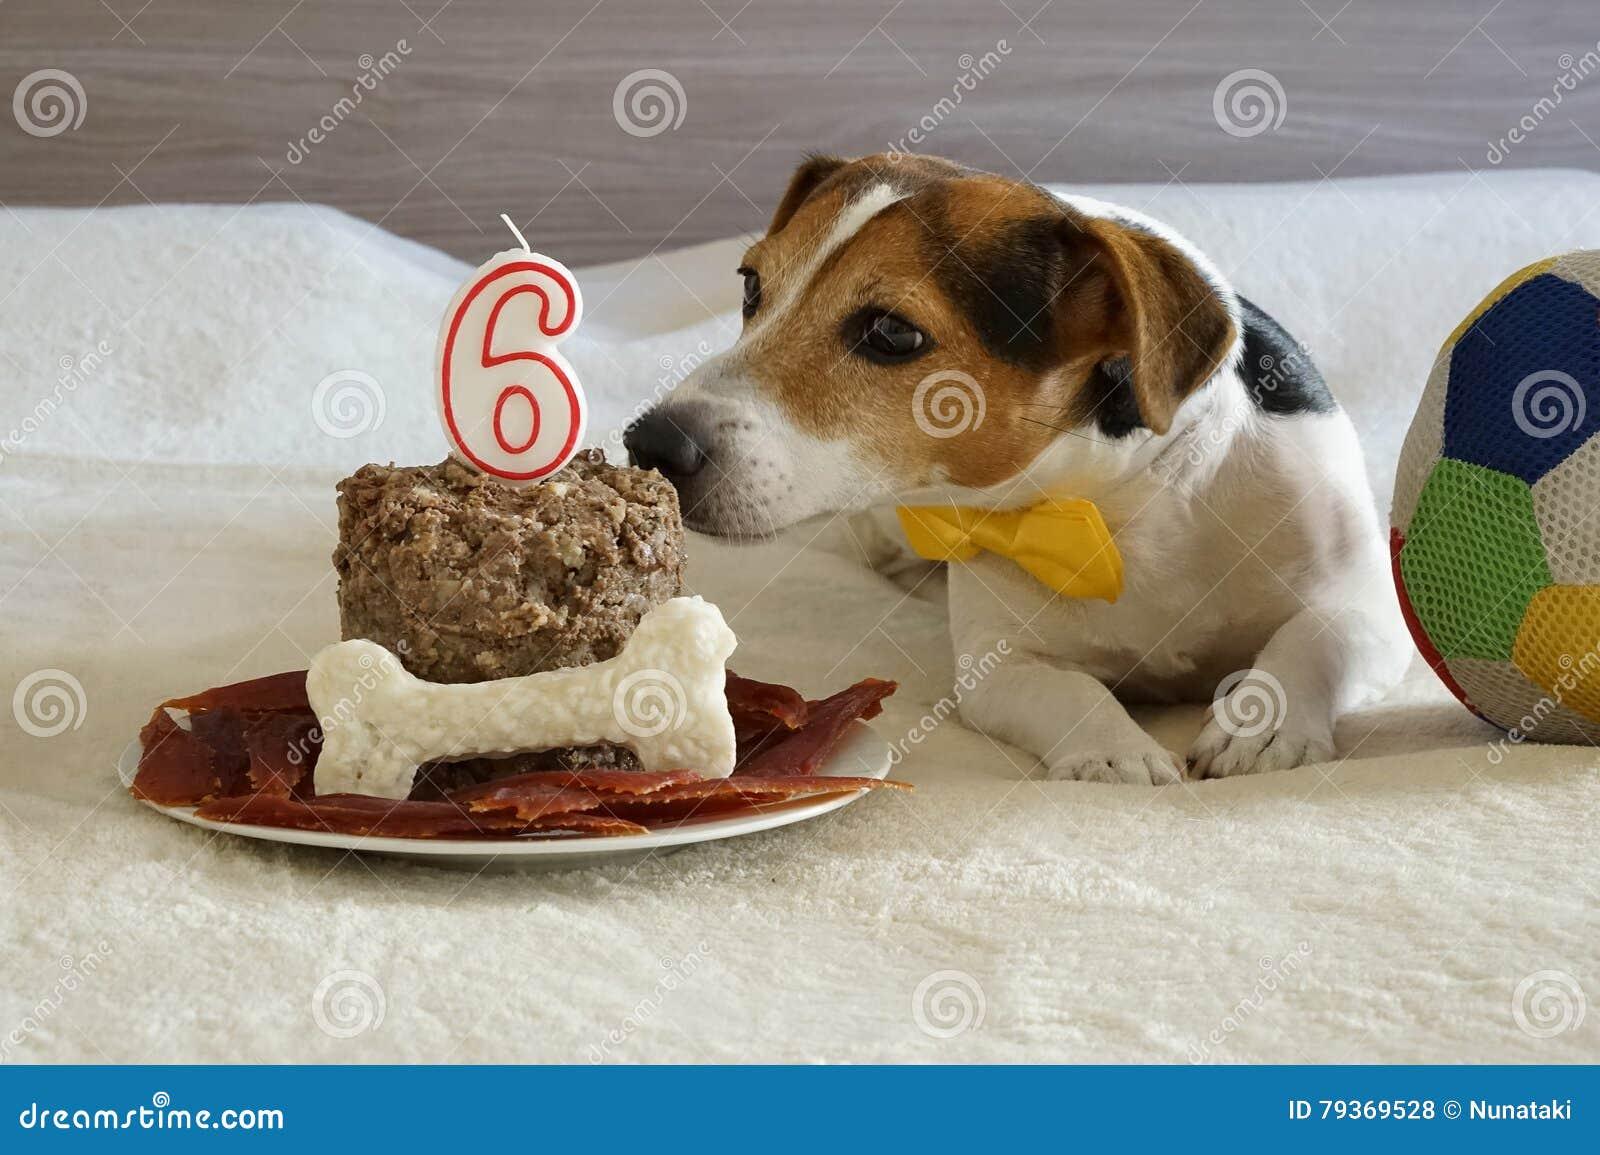 Amazing Jack Russell Dog Sniffing Cake On His Sixth Birthday Stock Photo Funny Birthday Cards Online Elaedamsfinfo